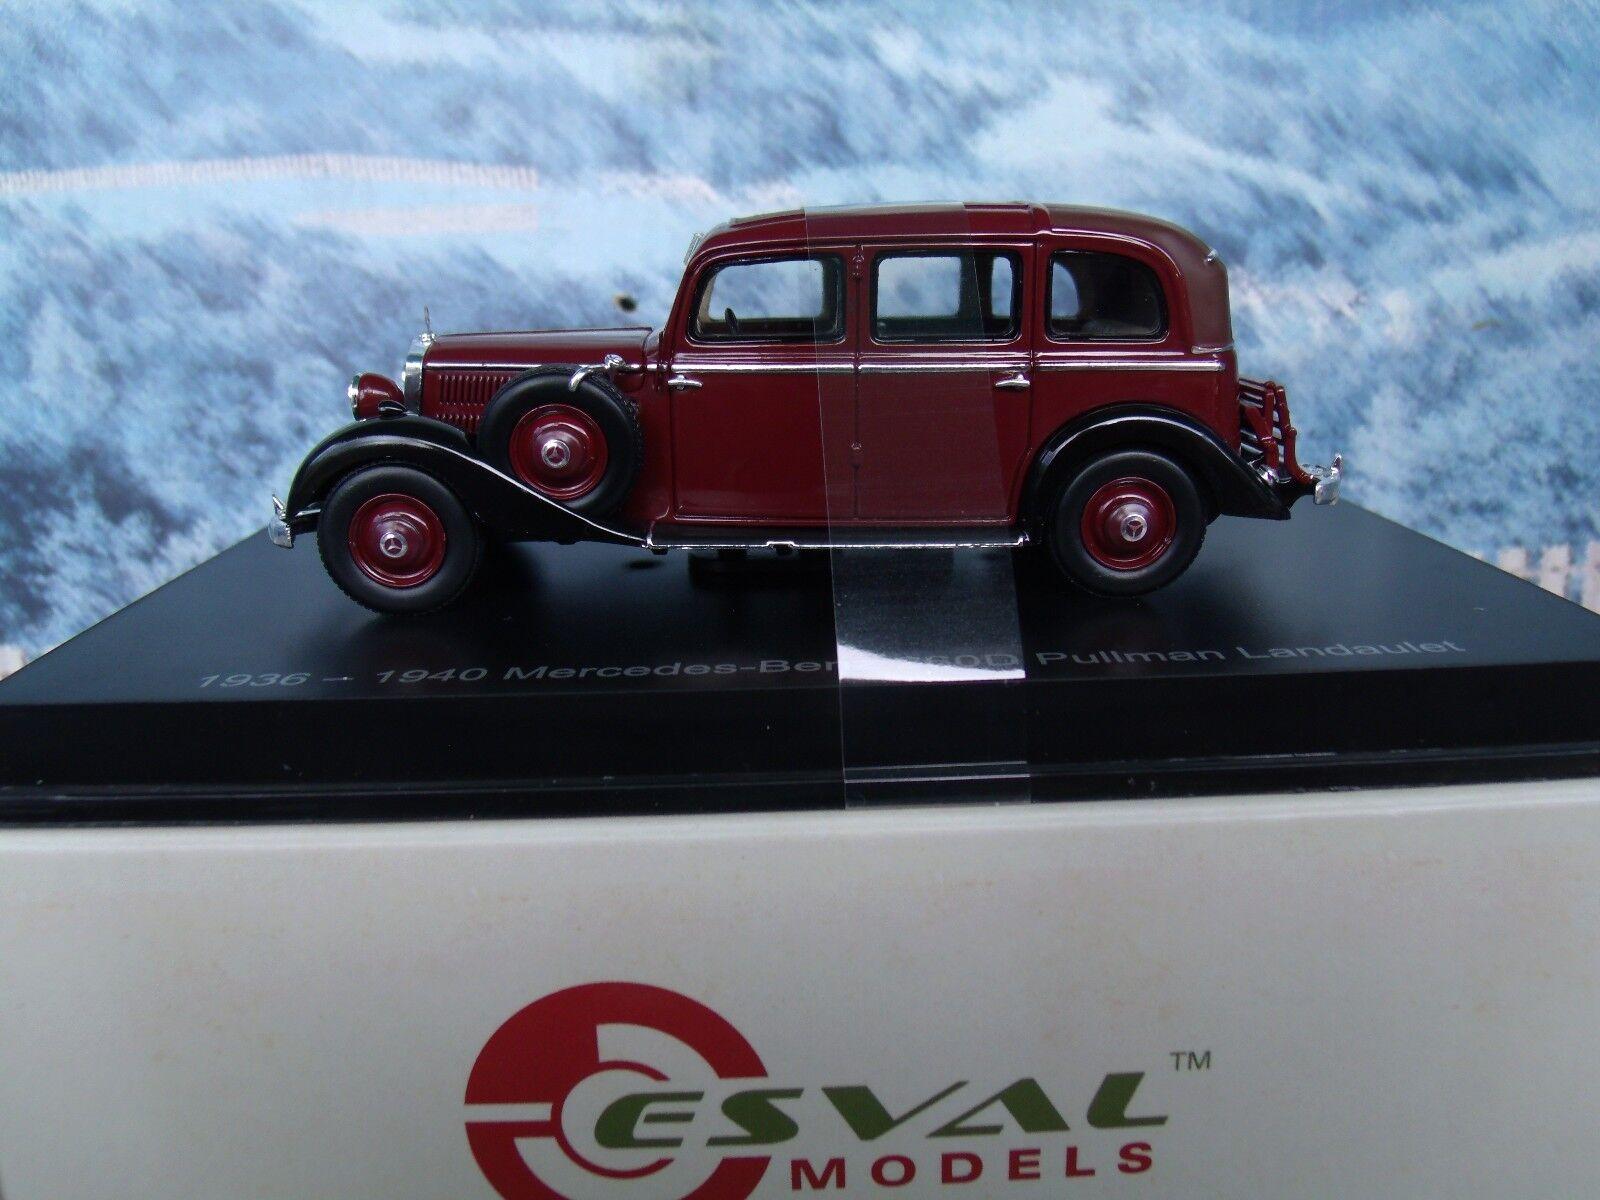 1 43 Esval Modelos 1936-40 Mercedes 260d Pullman Landaulet